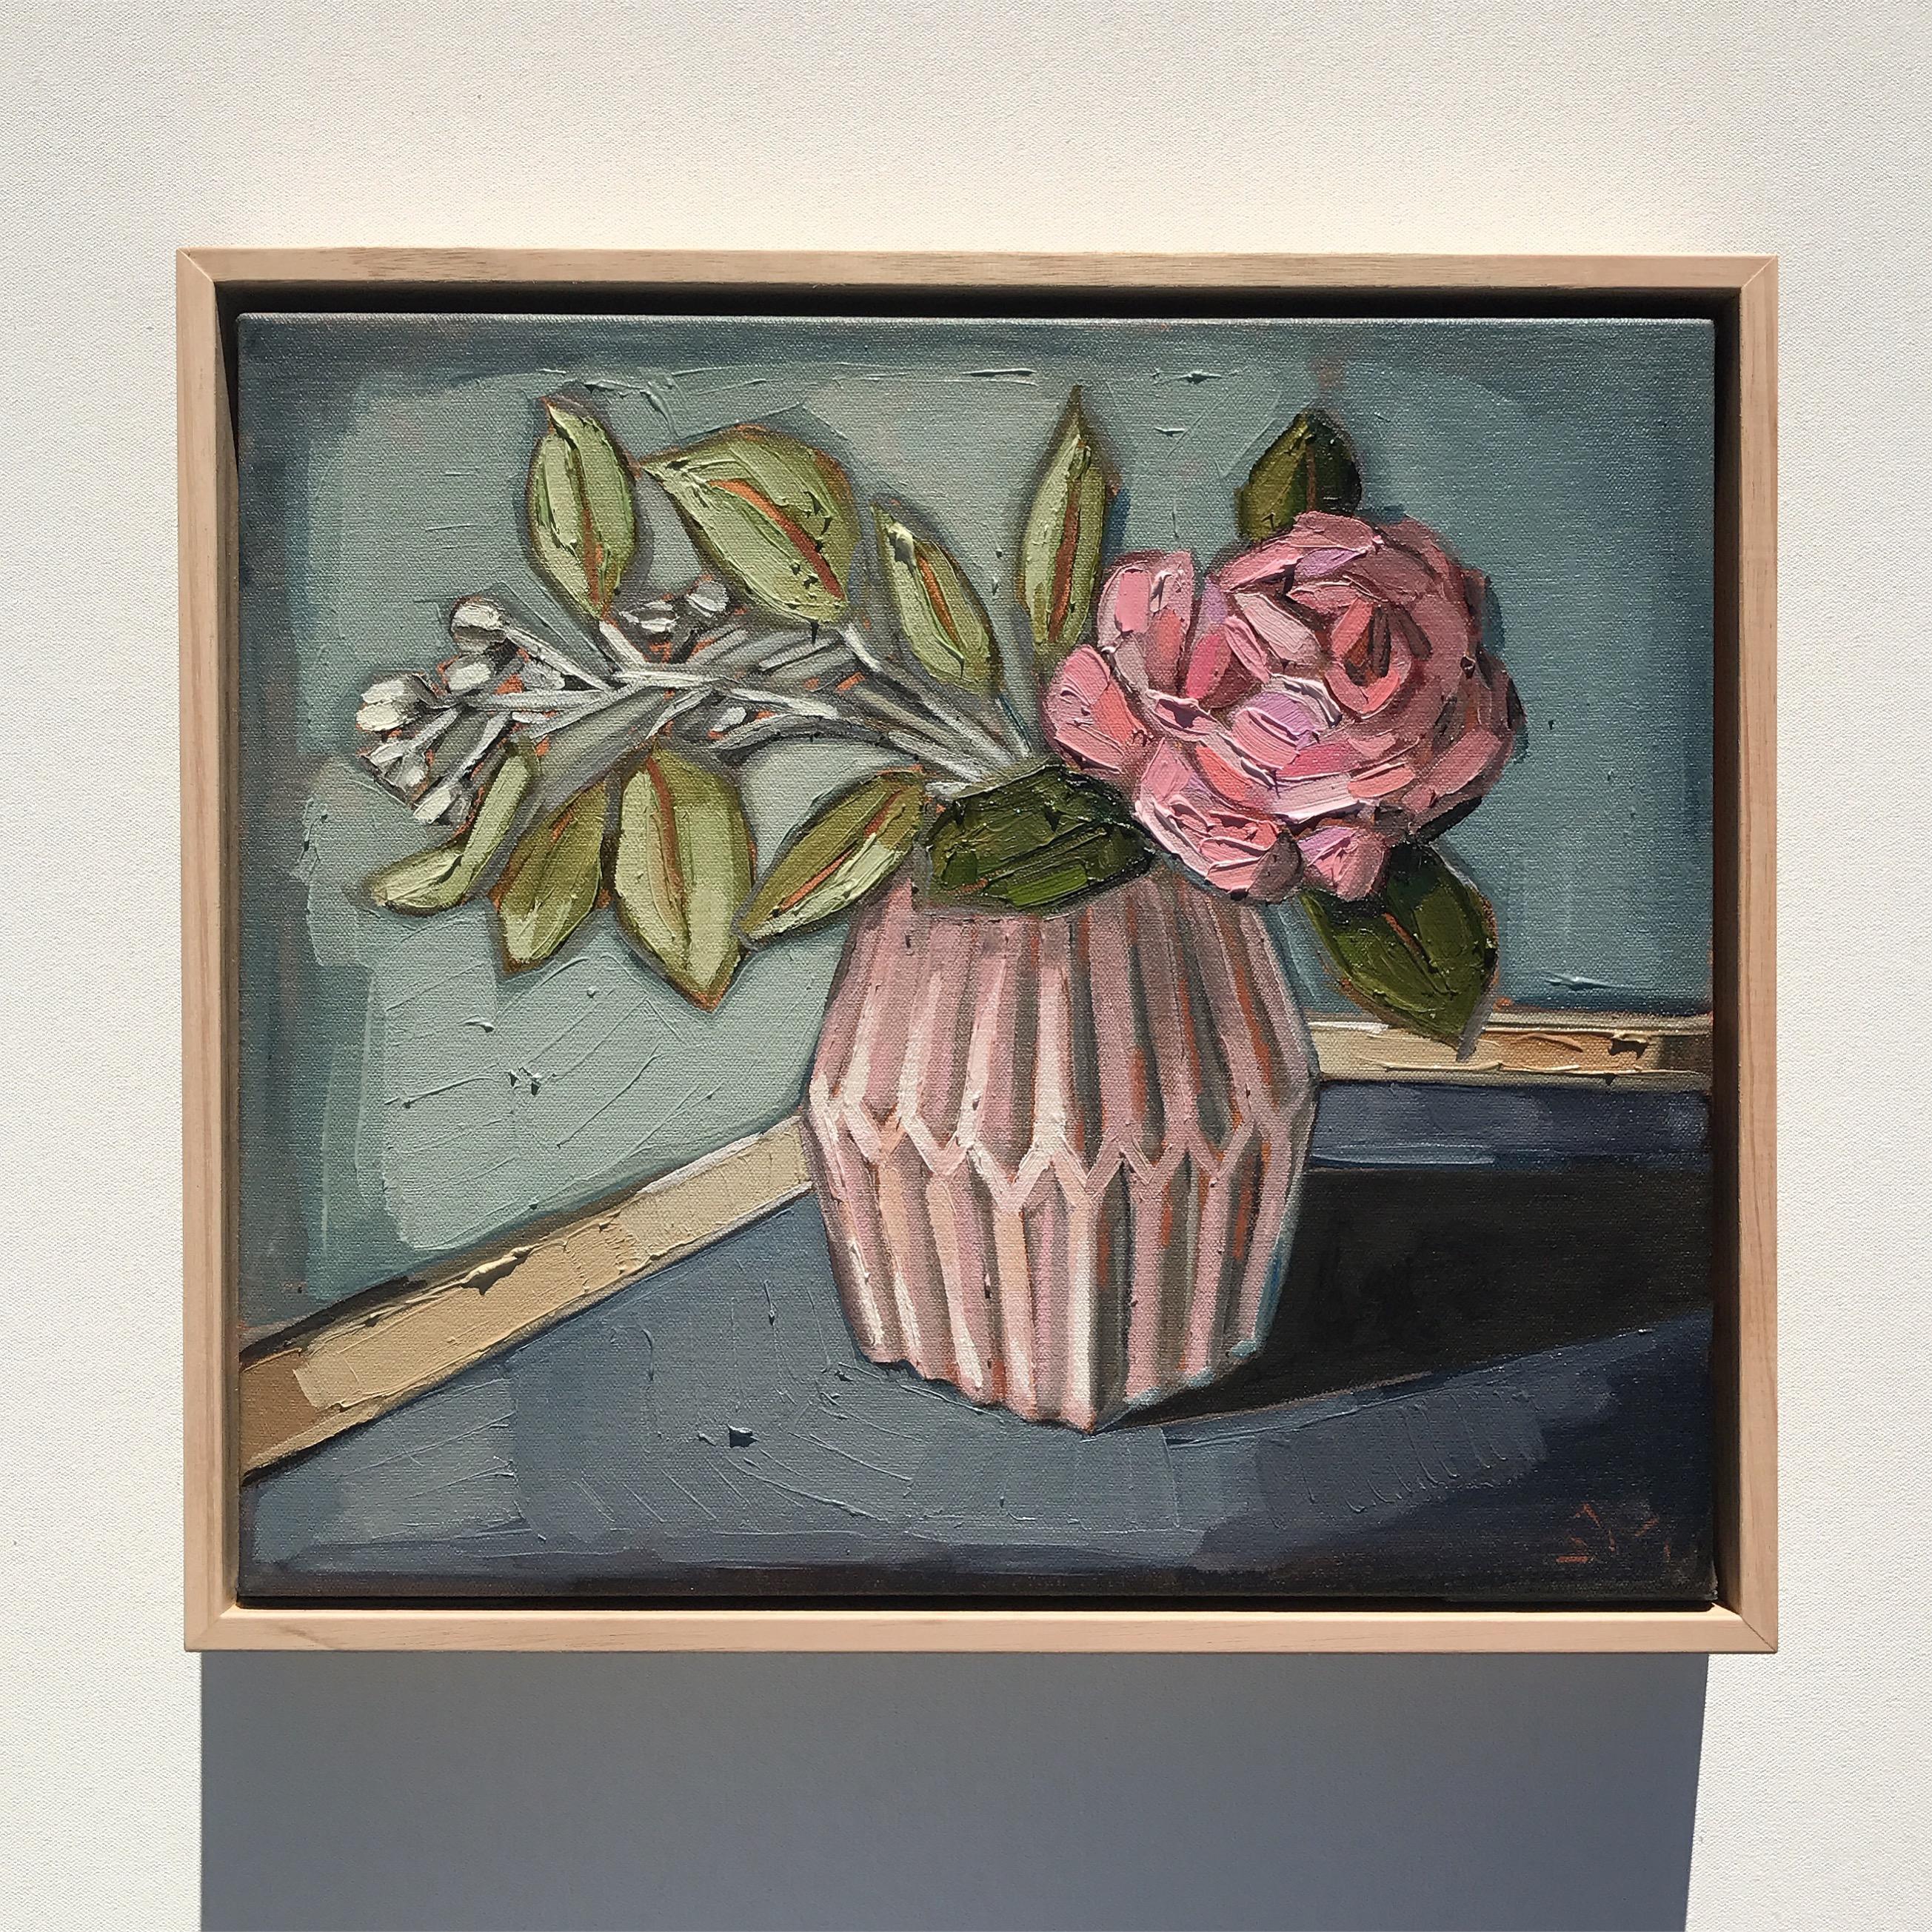 05_17 Gum Nuts & Pink Rose (41x36cm $795)